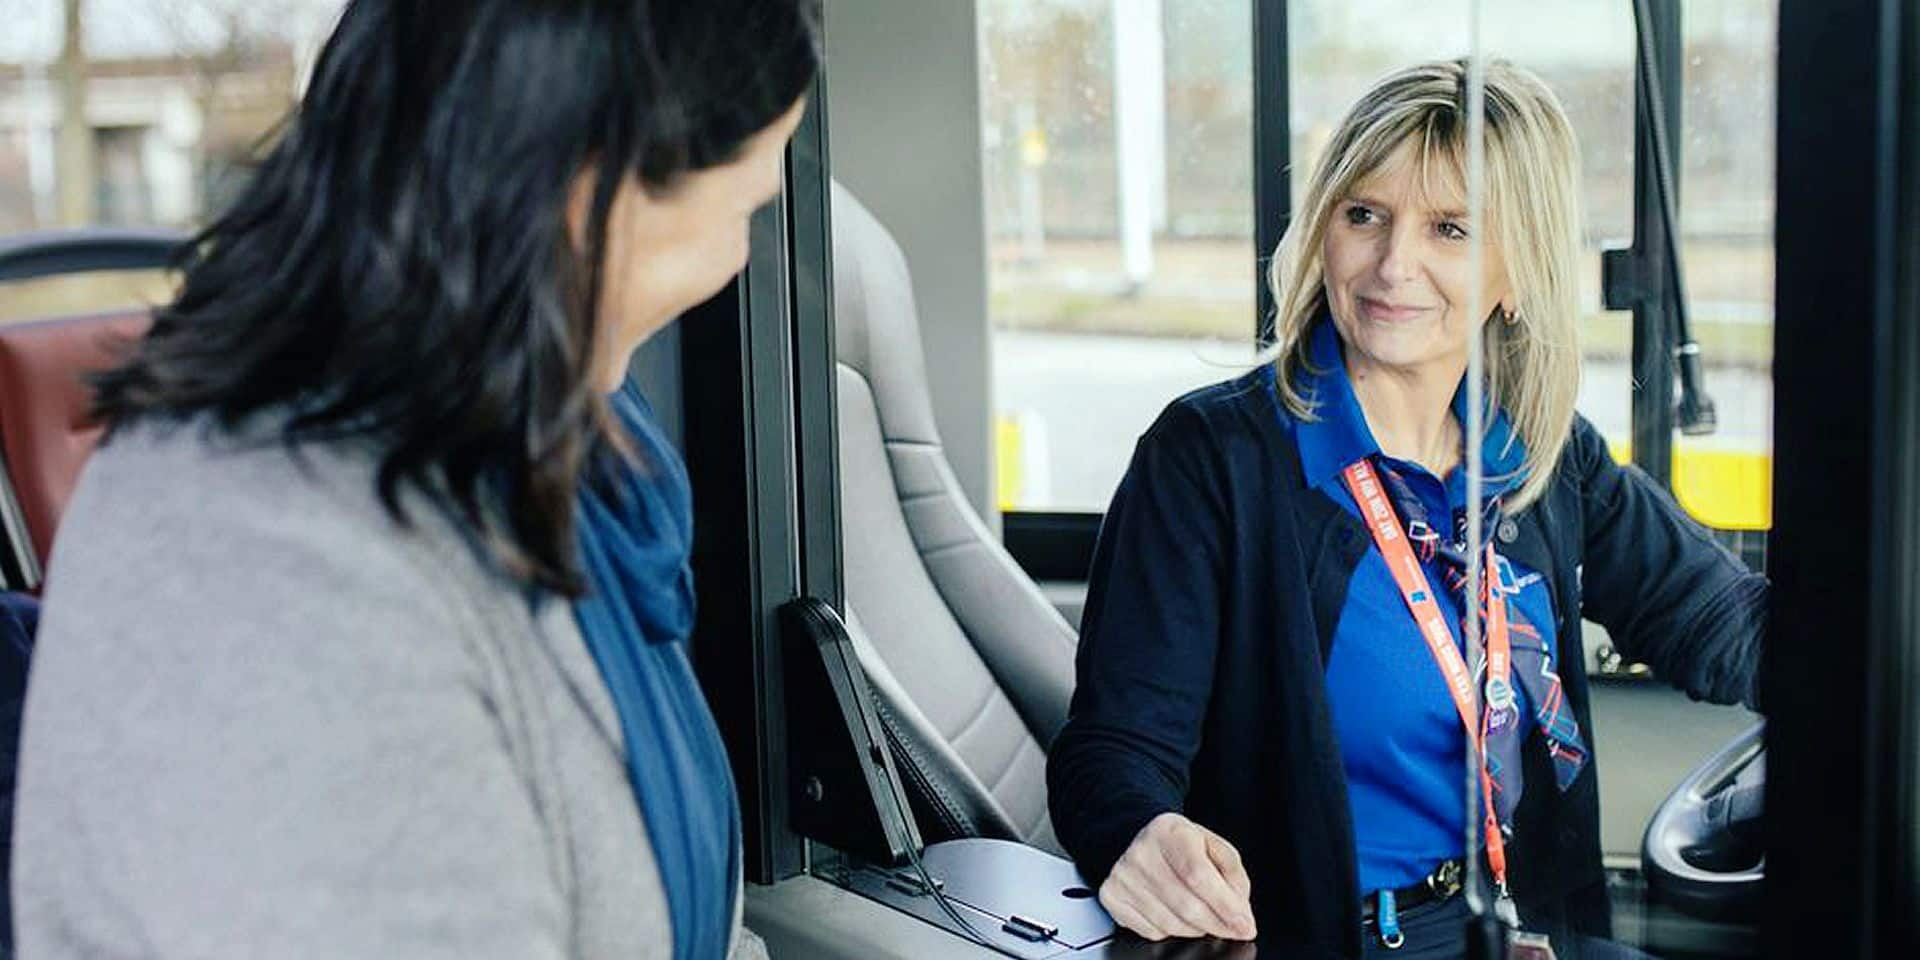 La Stib va recruter une cinquantaine de conducteurs de bus d'ici la fin de l'année